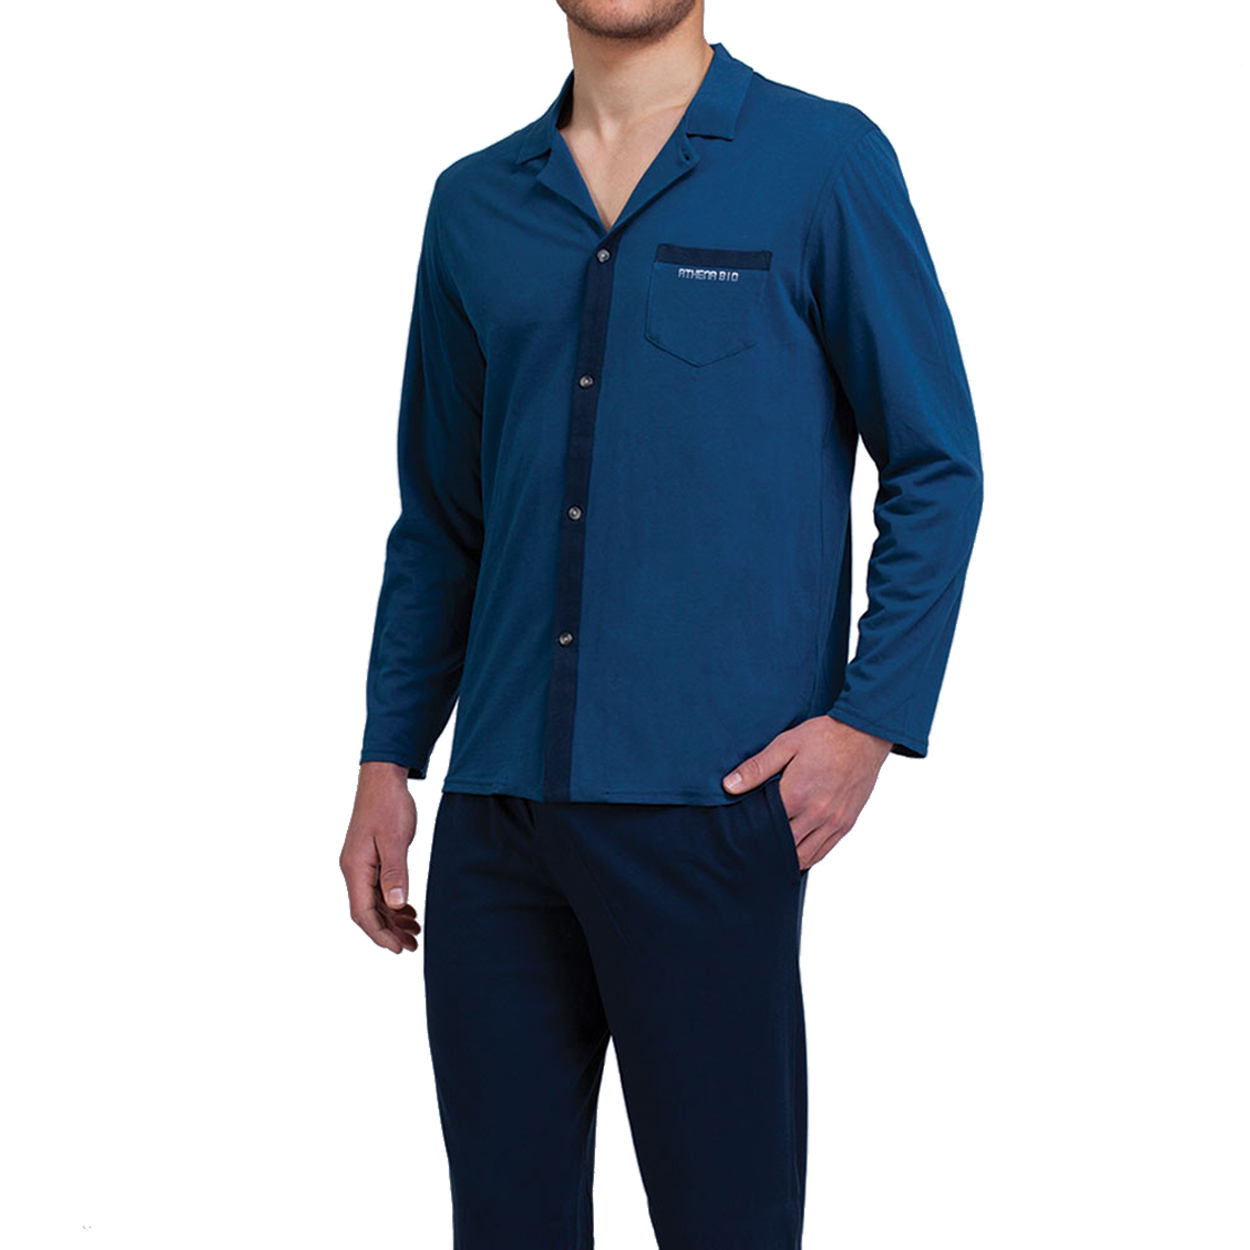 Pyjama long  en coton : veste bleu canard et pantalon bleu marine